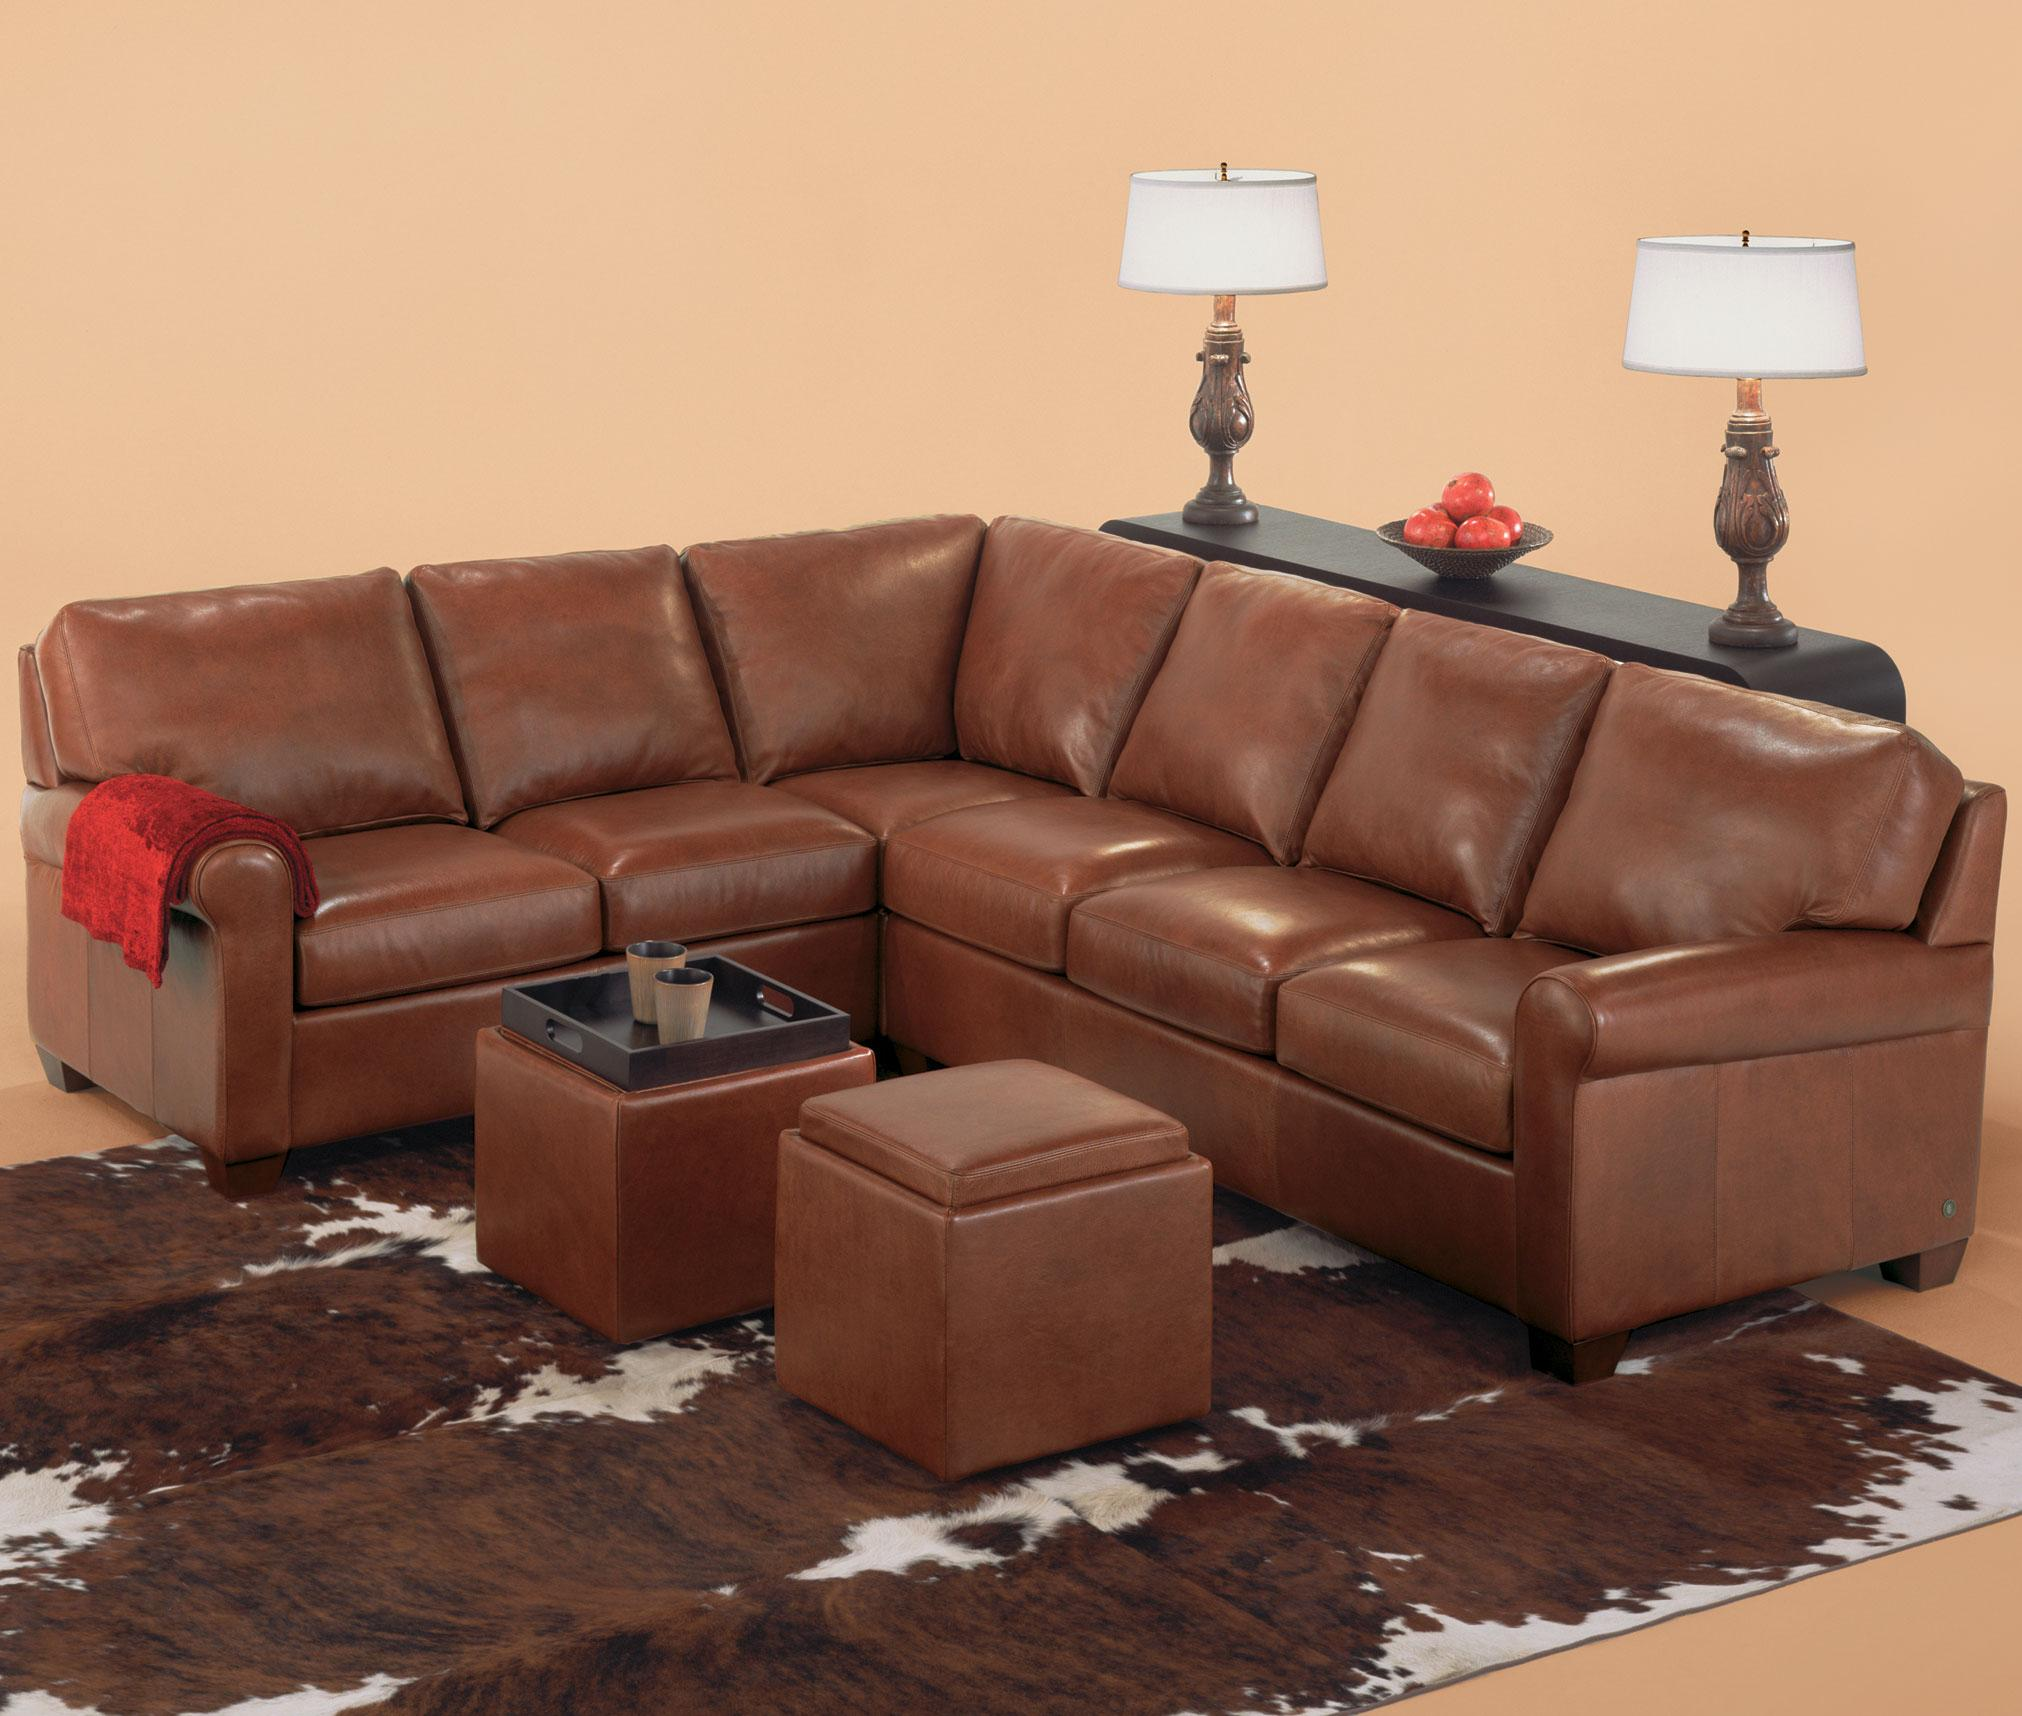 Saugerties Furniture Mart